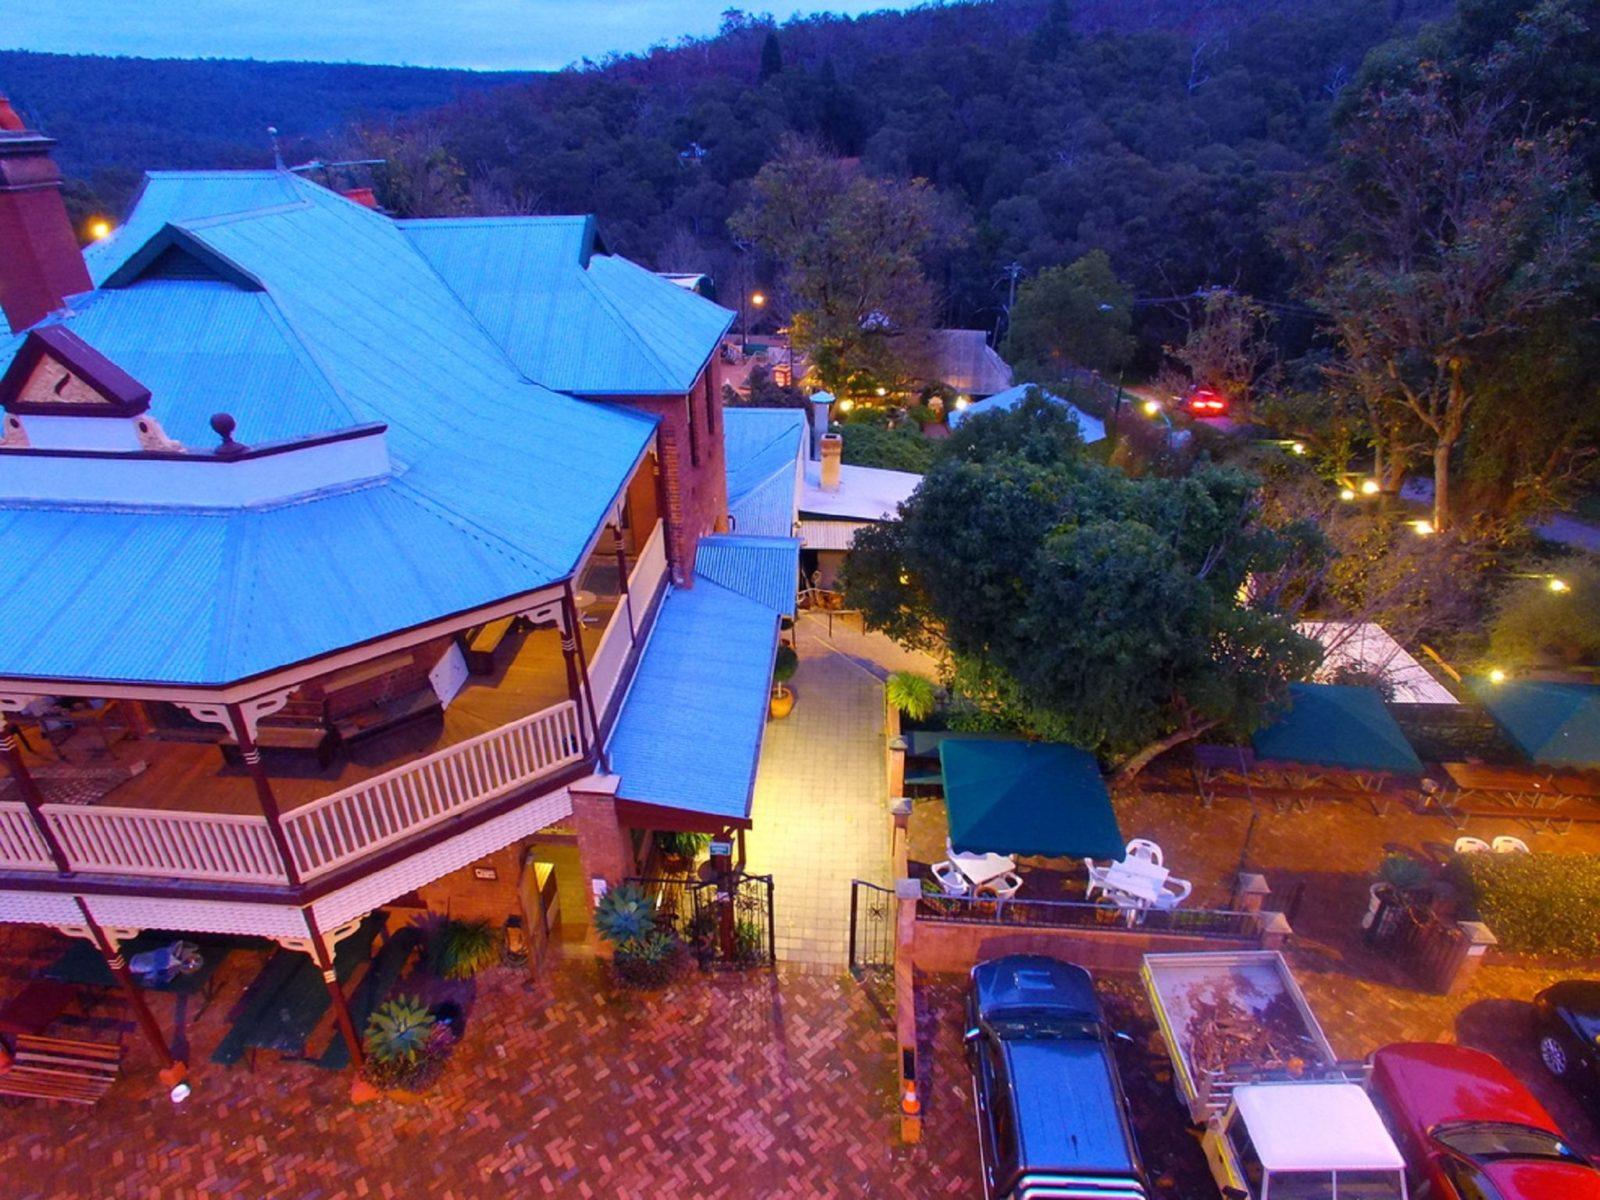 Mundaring Weir Hotel, Mundaring, Western Australia